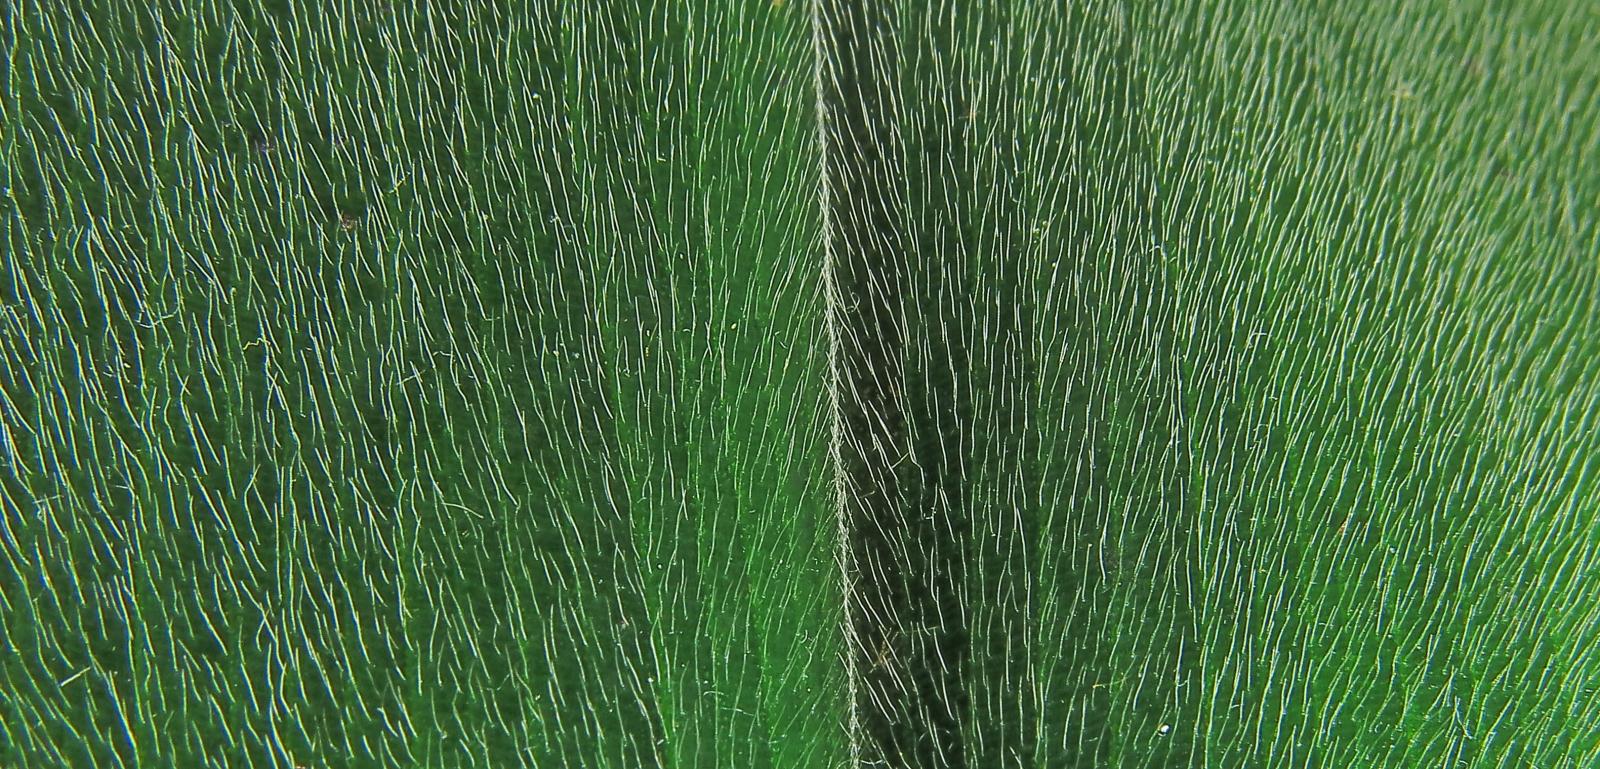 Photo# 18010 - Costus guanaiensis var. guanaiensis -  Jauneche, Ecuador, leaf hairs upper side